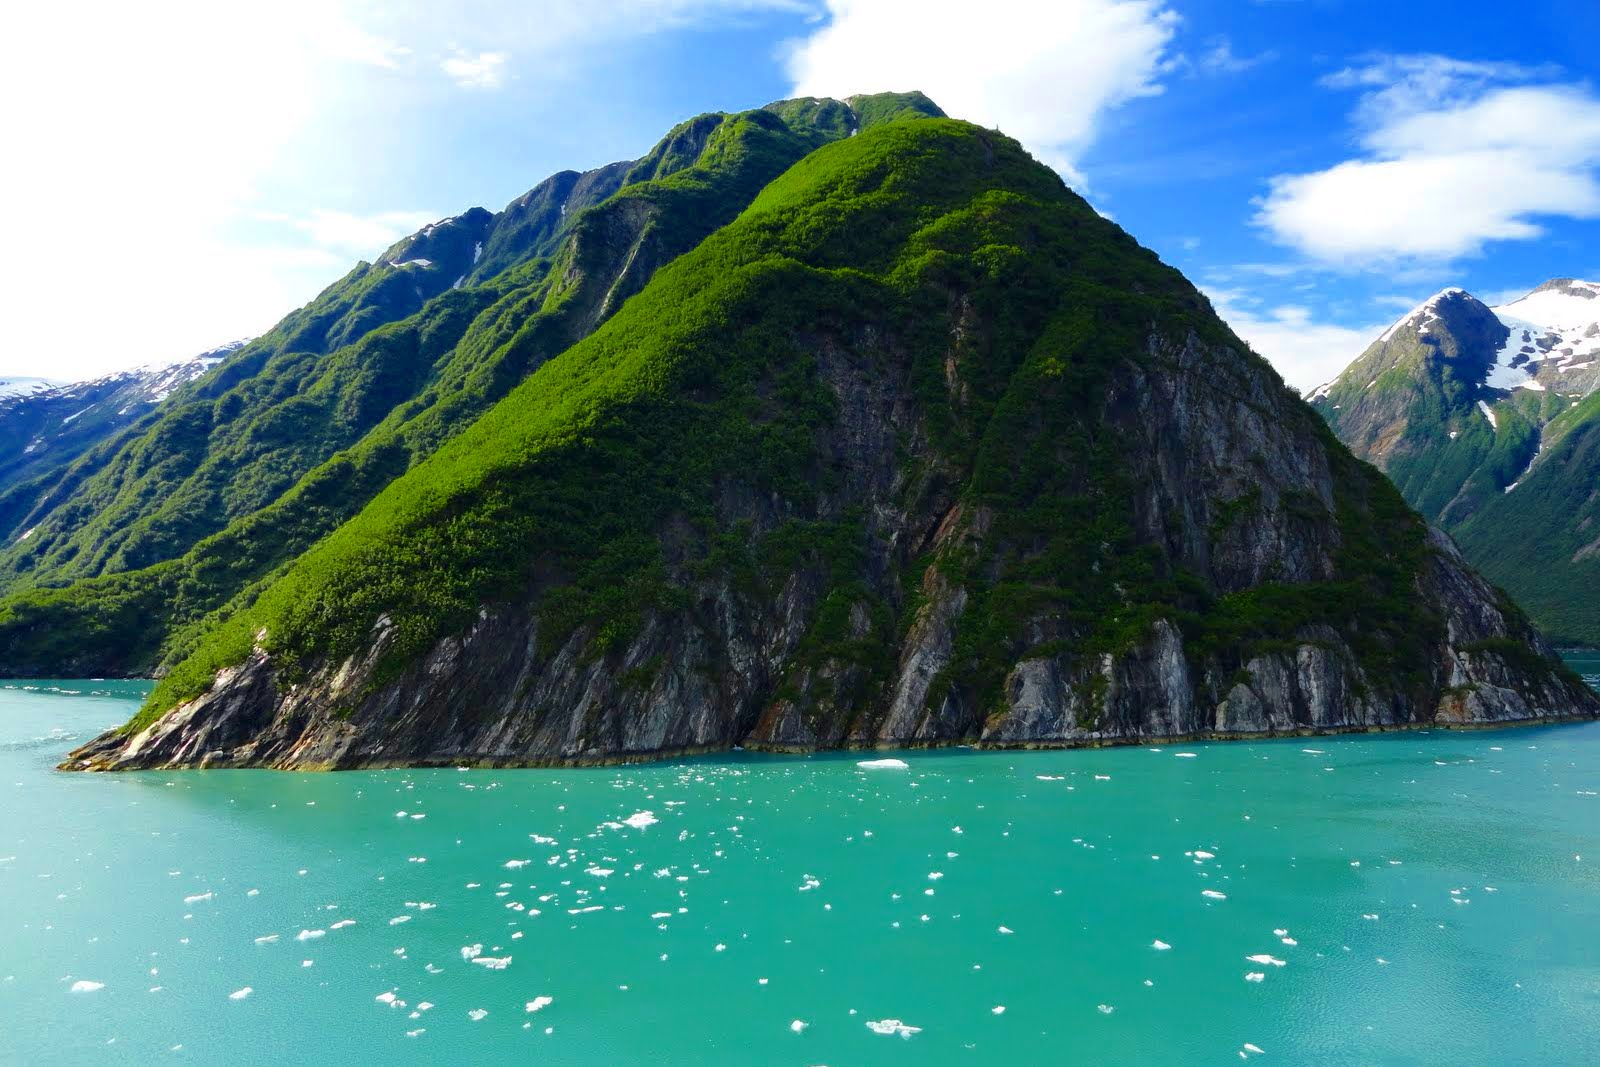 Cruise Tracy Arm Fjord Alaska Cruise Port Cruiselinecom - Tracy arm fjord